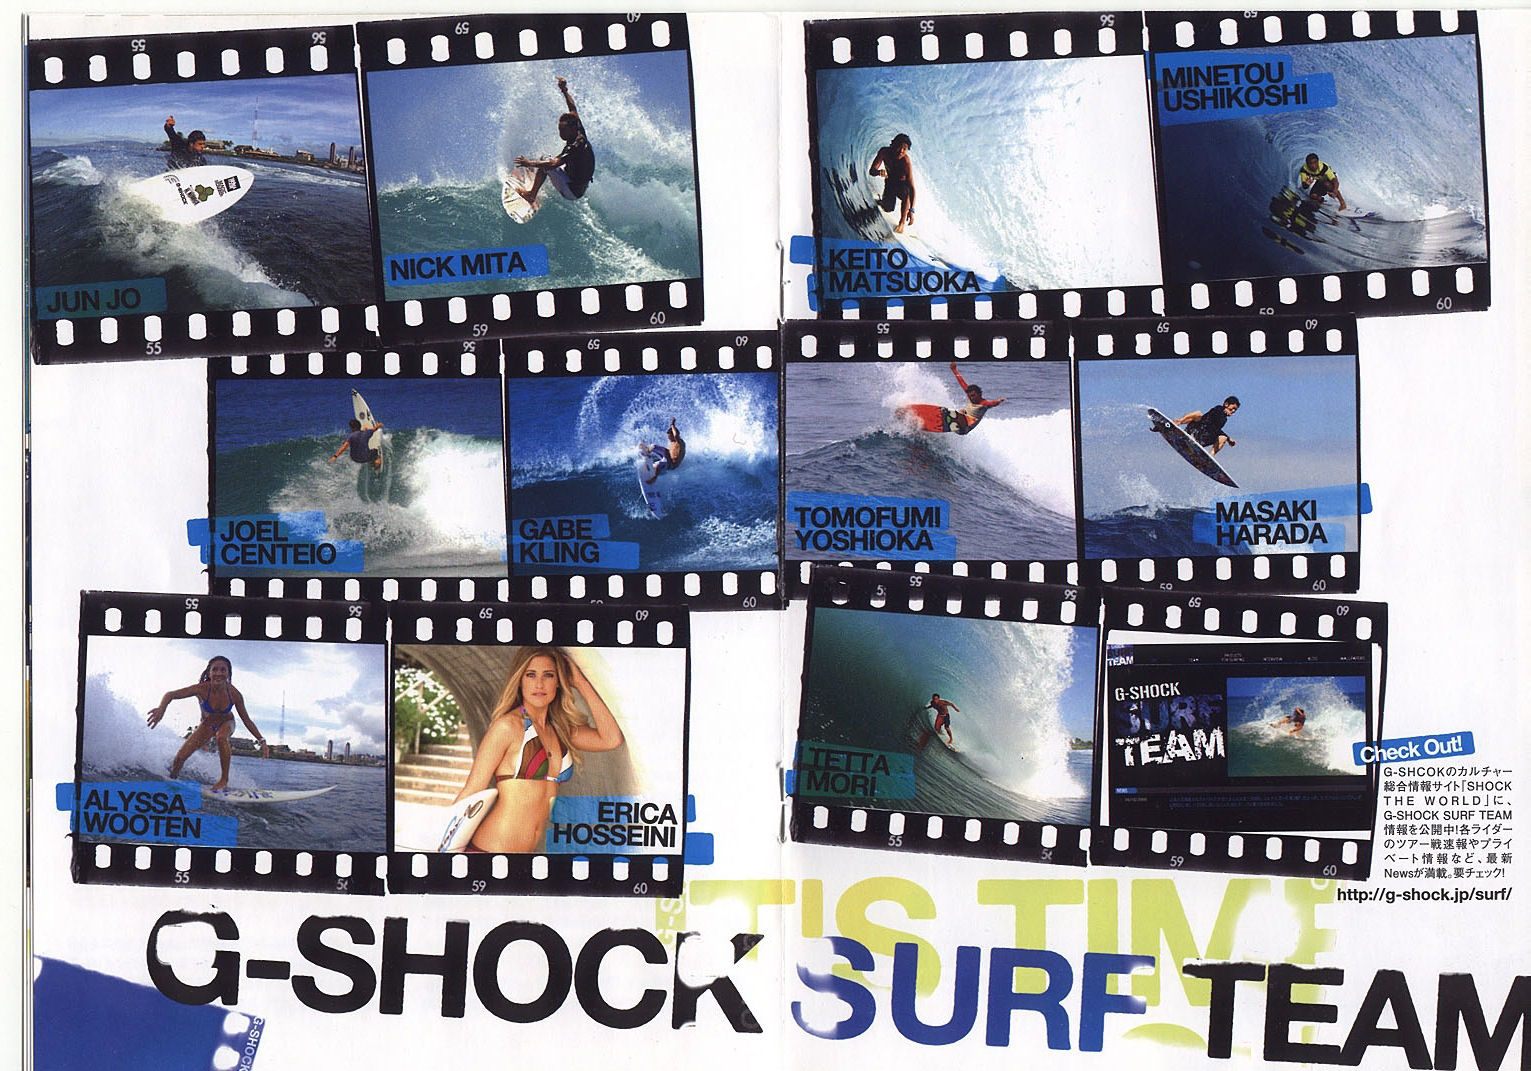 Casio-G-Shock-Surf-Collection-Summer-2009-Page-5.jpg